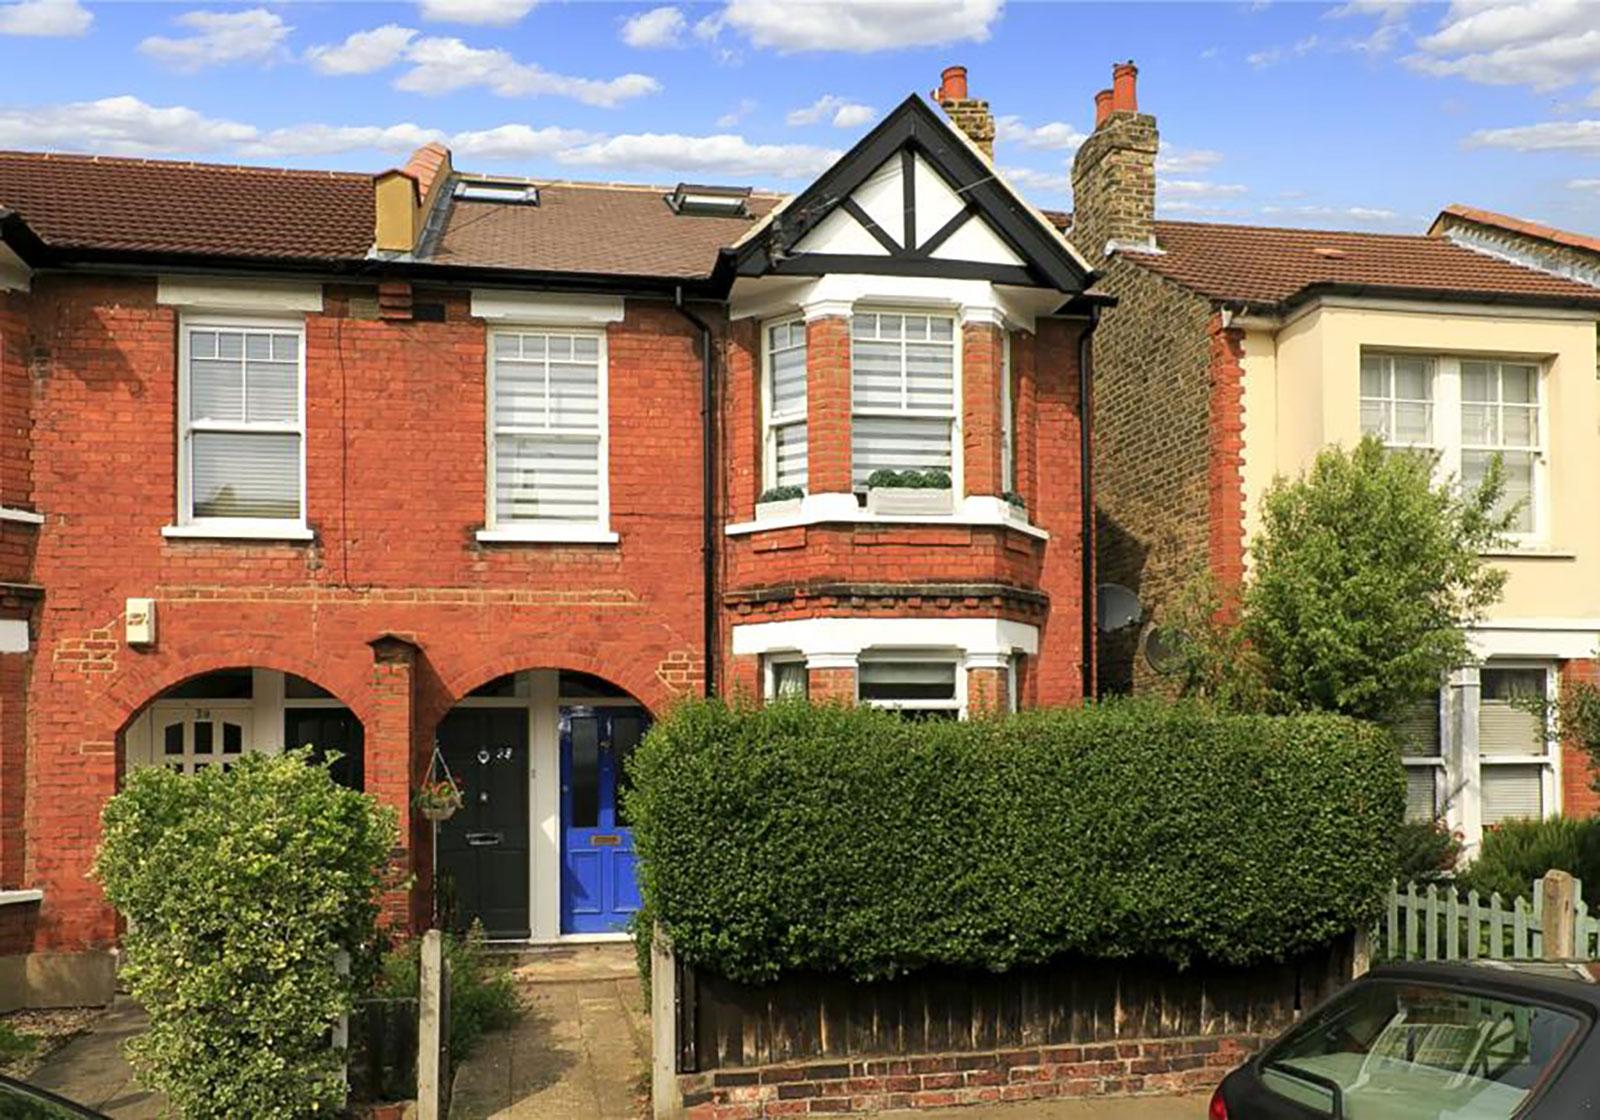 33 Godstone Road, St Margarets, Twickenham, TW1 1JY - Antony Roberts